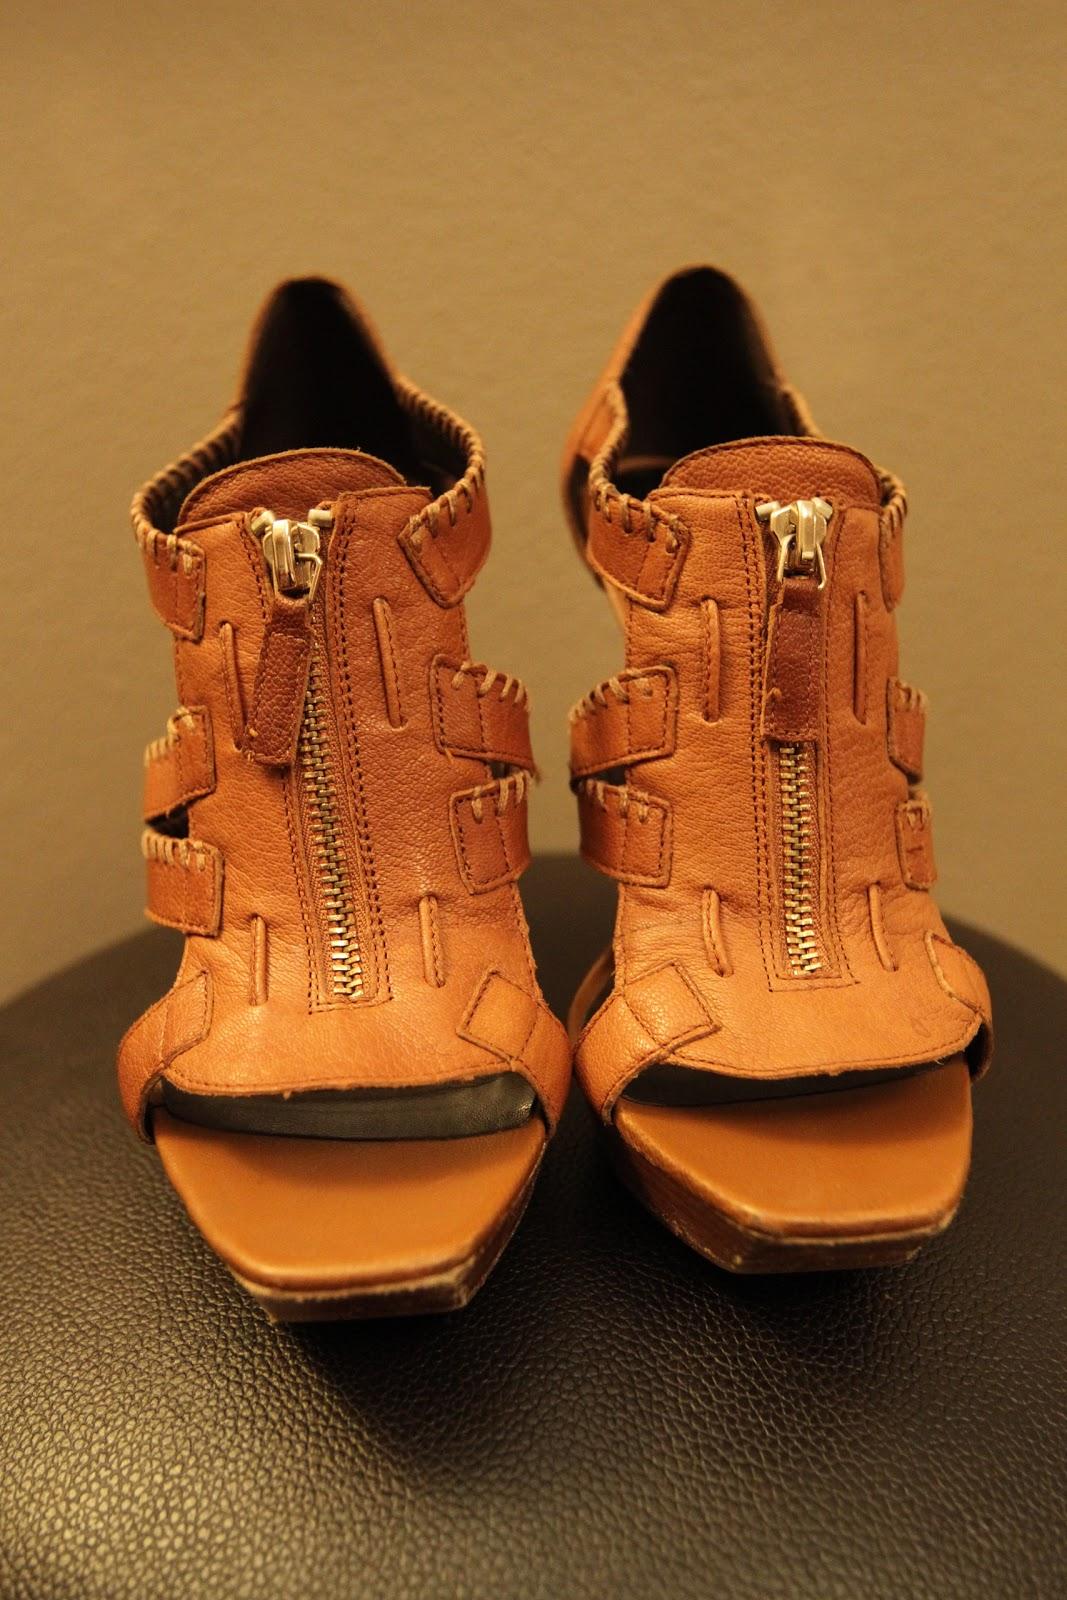 bc43b85a8c01 THE HAUTE SHOP  jessica simpson striker heels